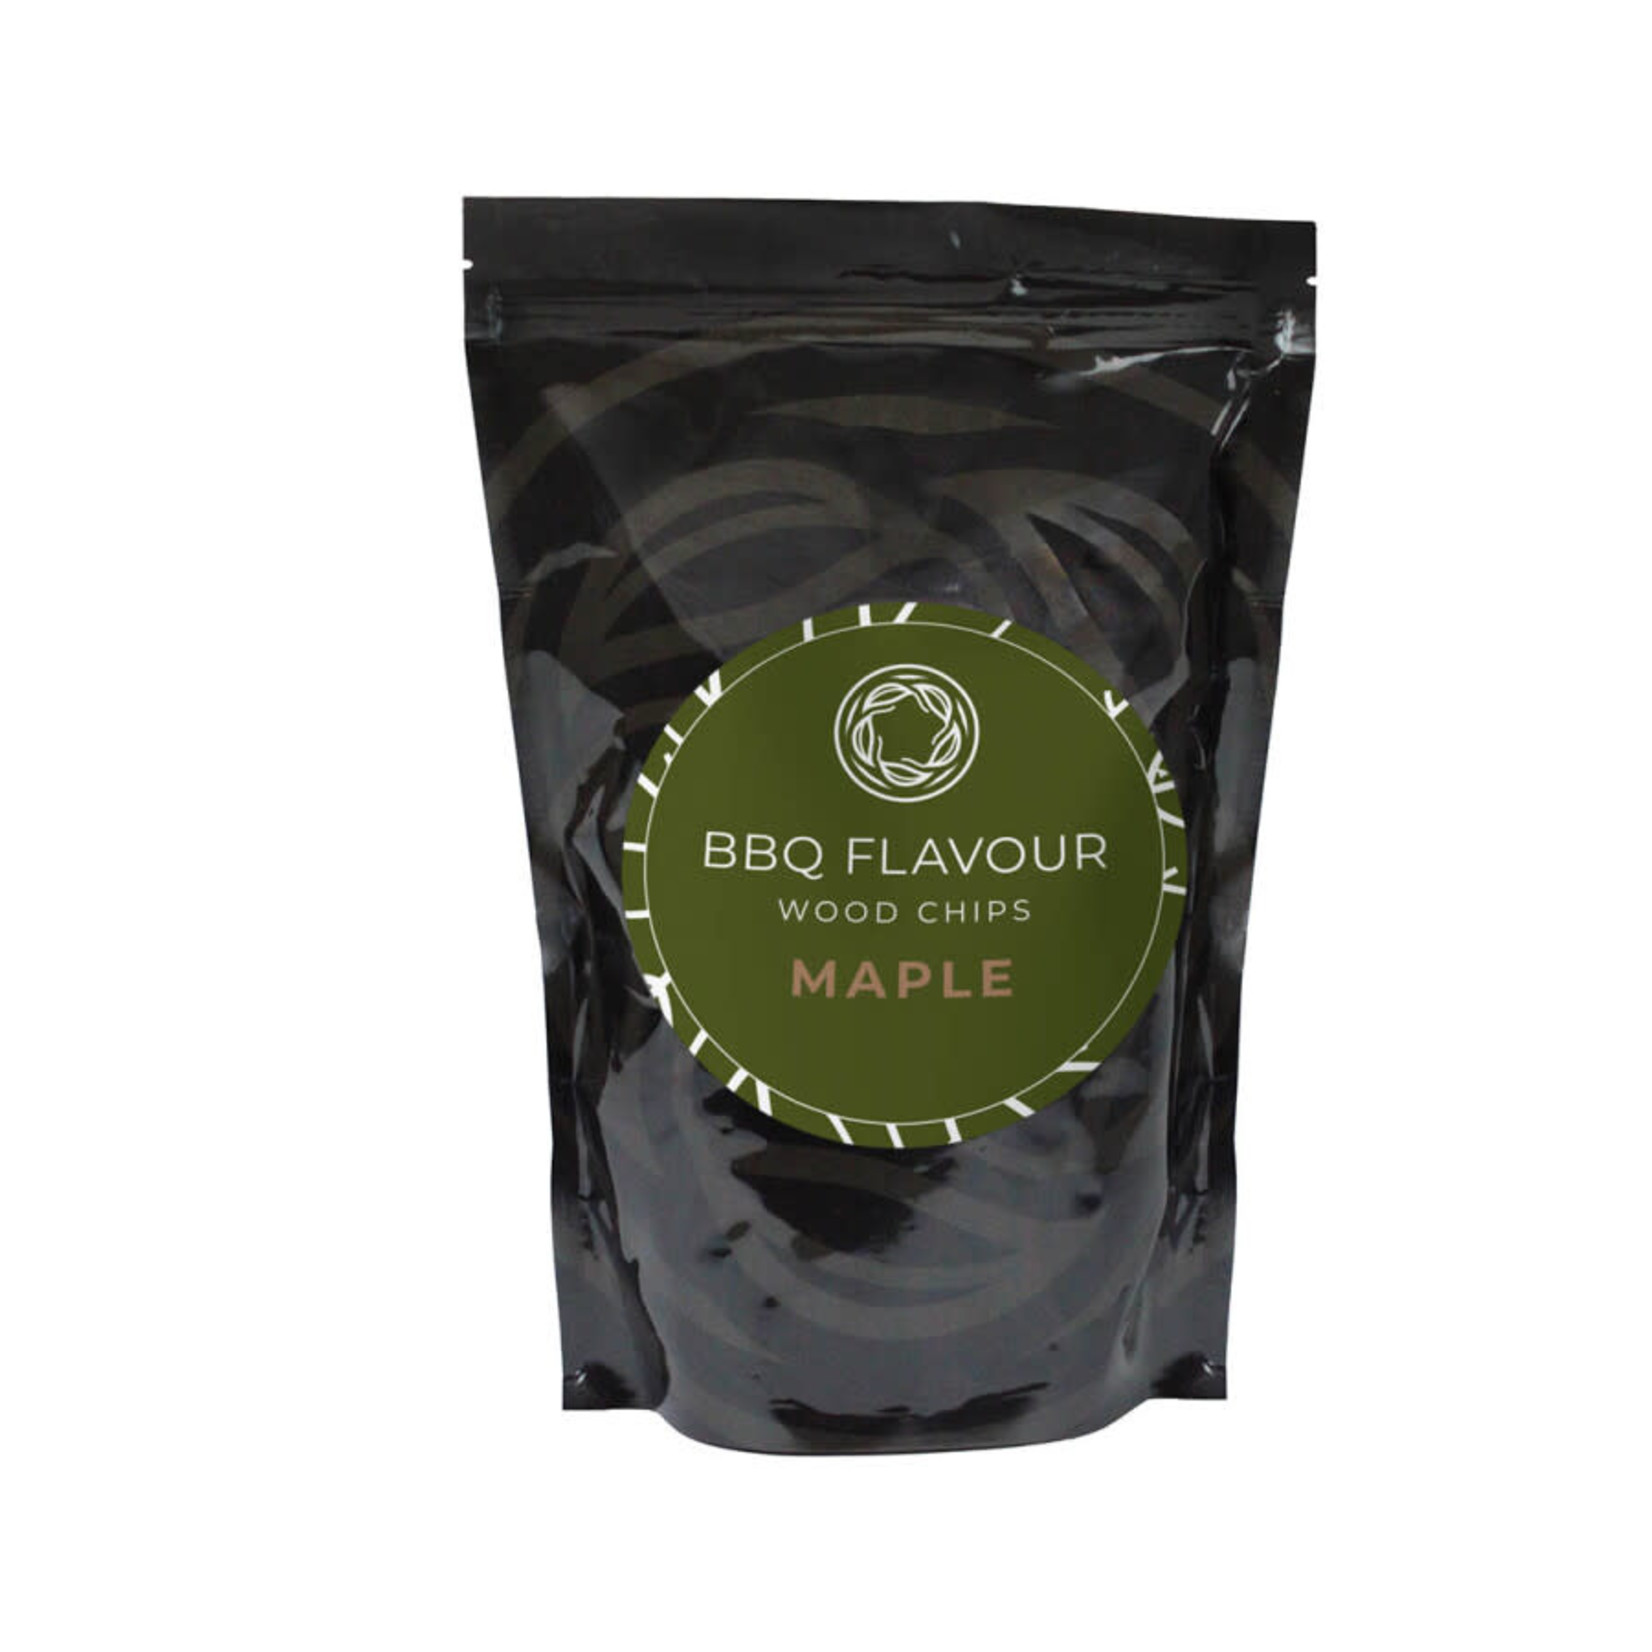 BBQ Flavour BBQ Flavourrookhout  chips Maple 500 gr